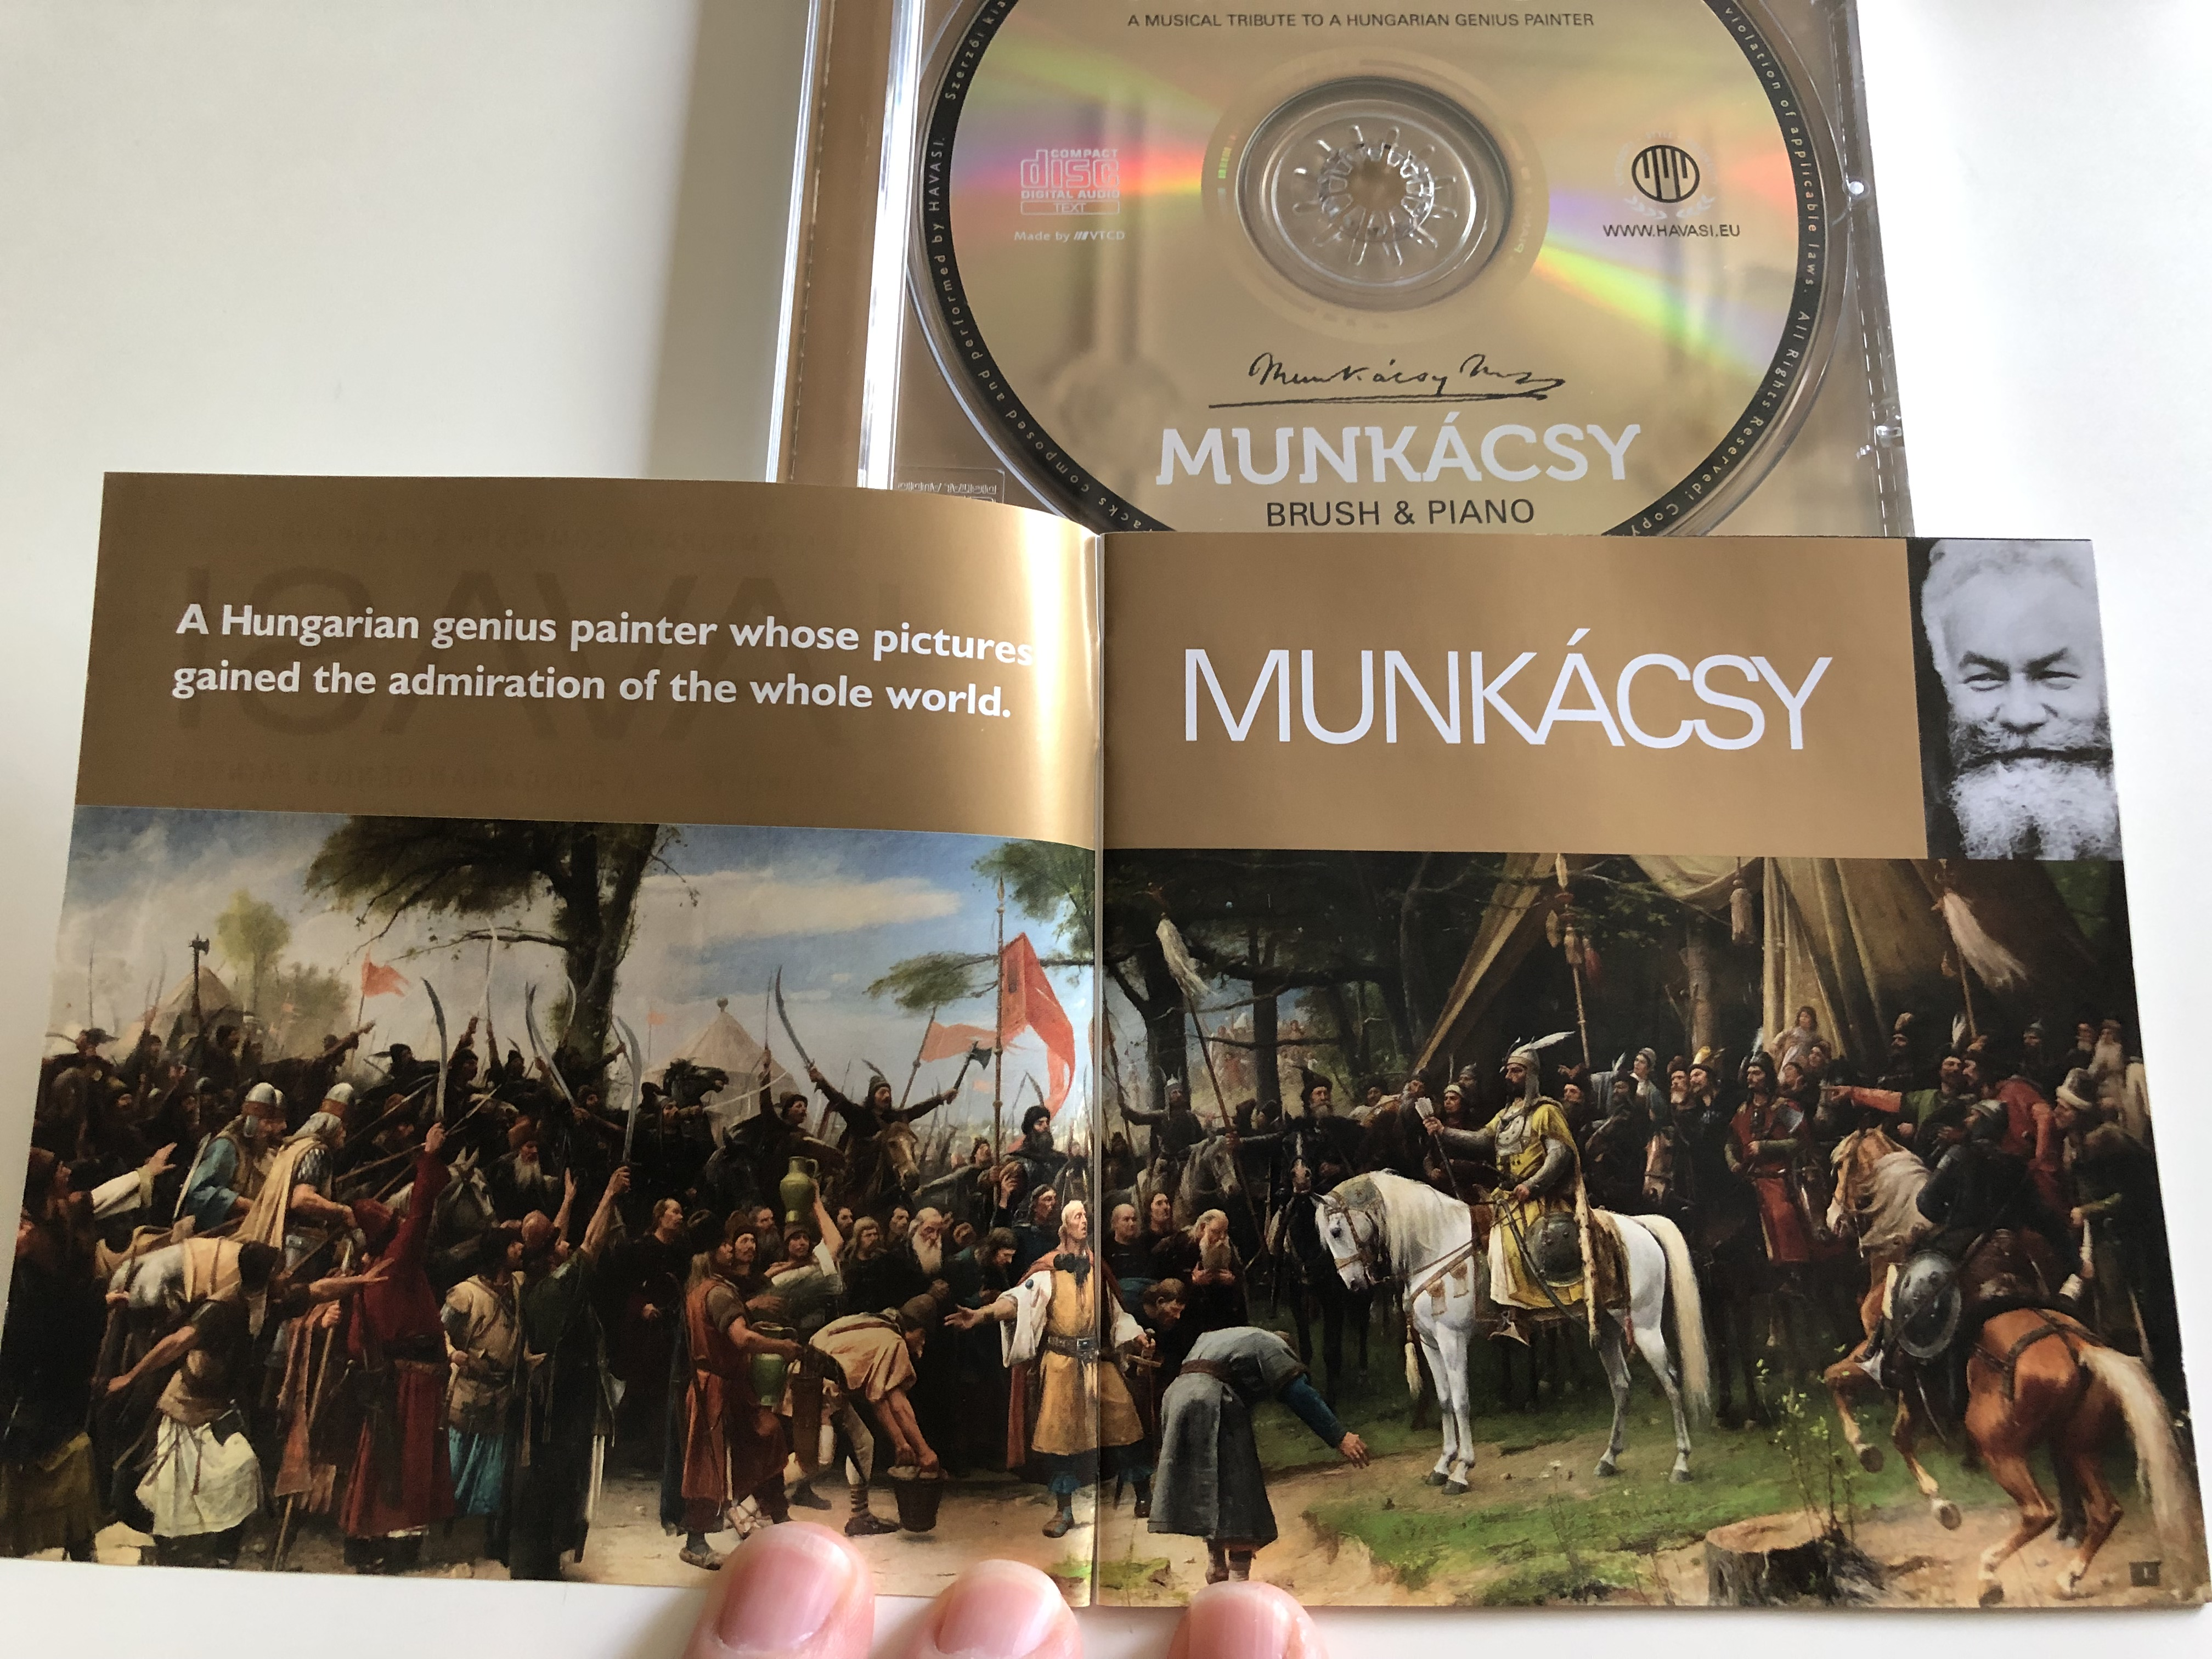 havasi-bal-zs-brush-piano-musical-tribute-to-hungarian-genius-painter-munk-csy-mih-ly-featuring-dohn-nyi-symphony-orchestra-budafok-audio-cd-2012-zenei-tisztelg-s-a-magyar-fest-g-niusz-el-tt-2-.jpg